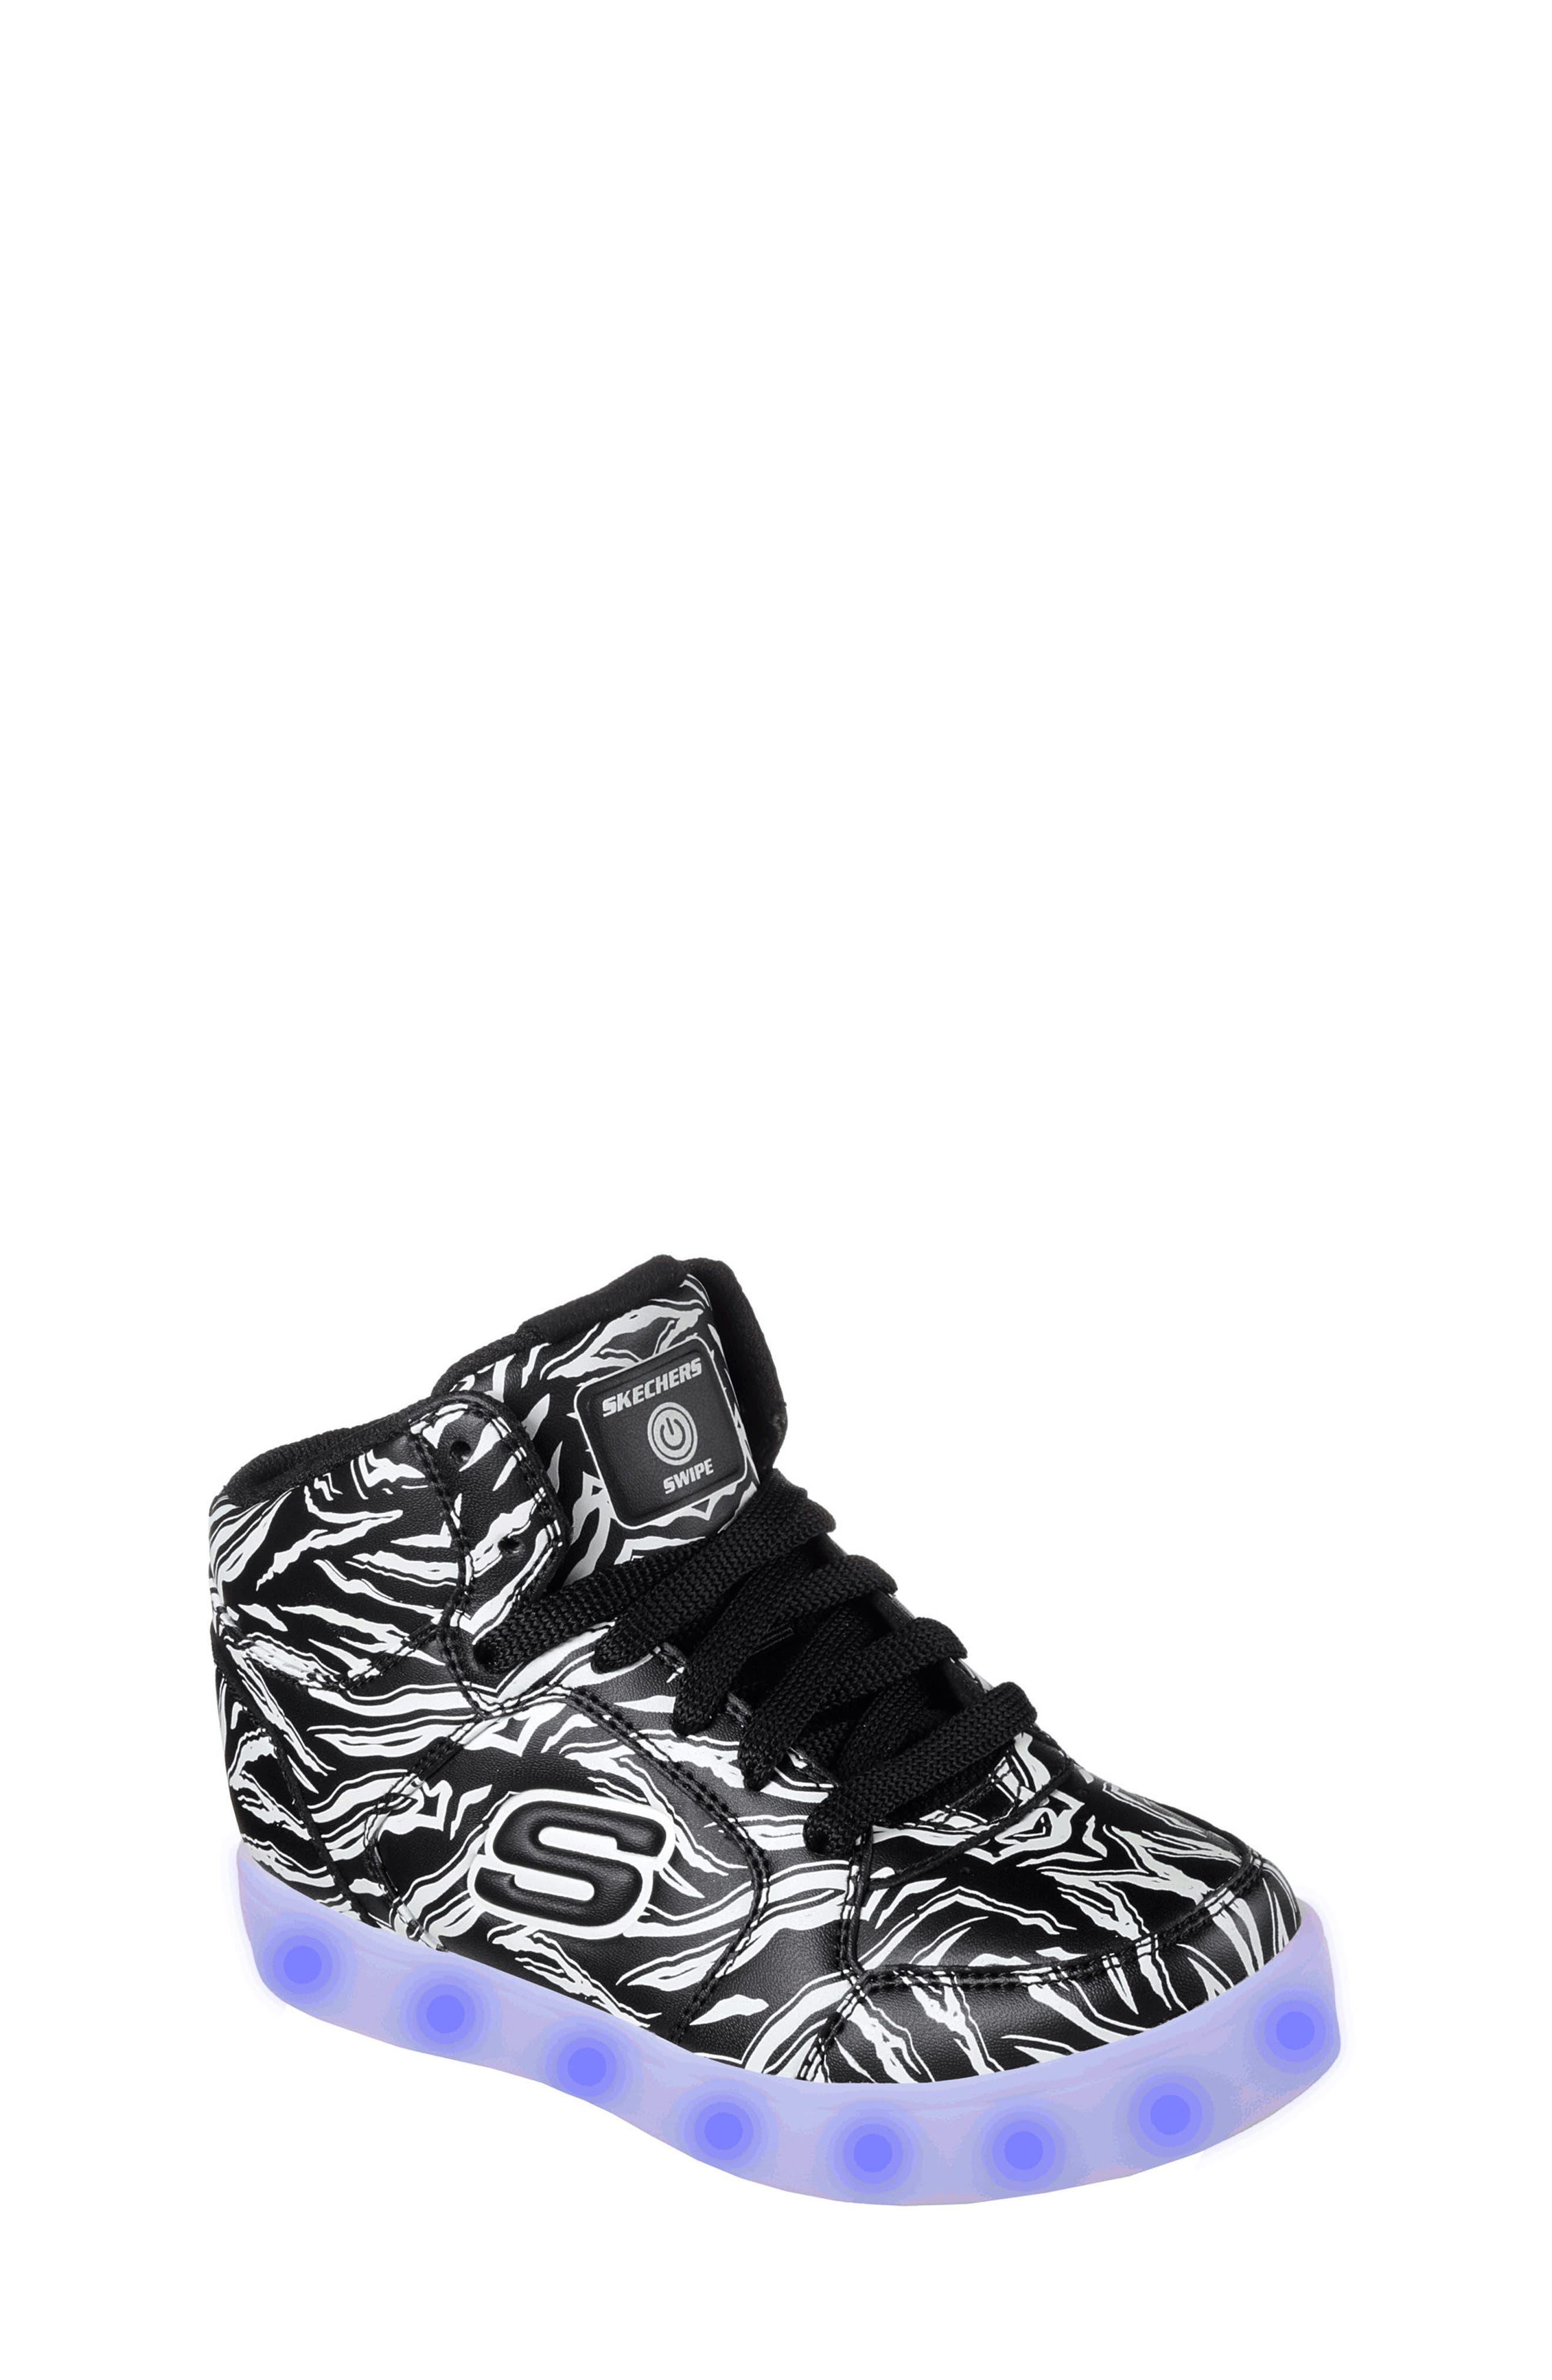 Energy Lights Glow in the Dark Sneaker,                             Alternate thumbnail 2, color,                             Black